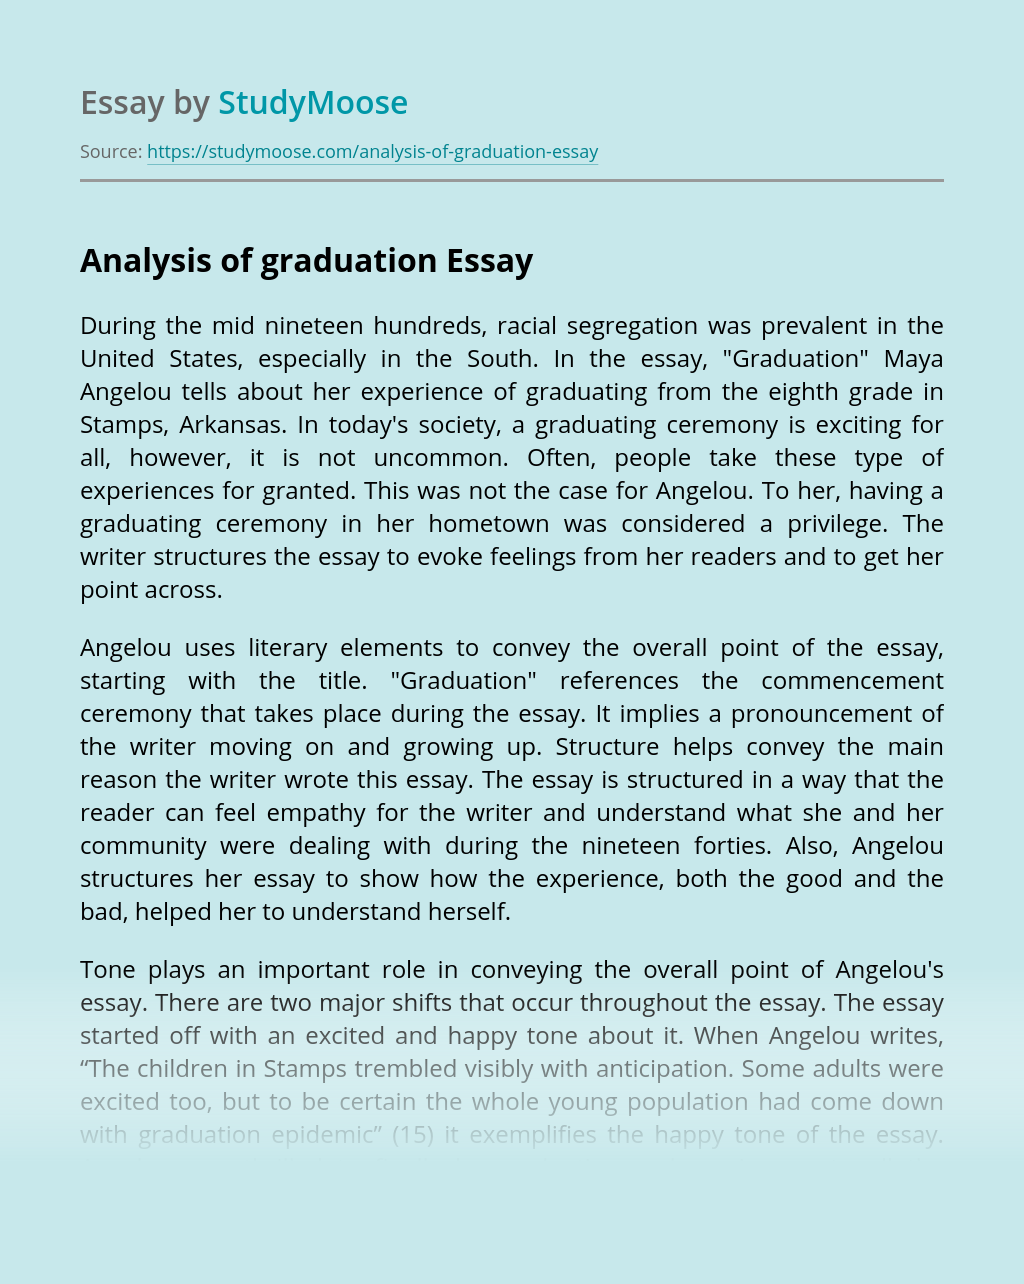 Analysis of graduation